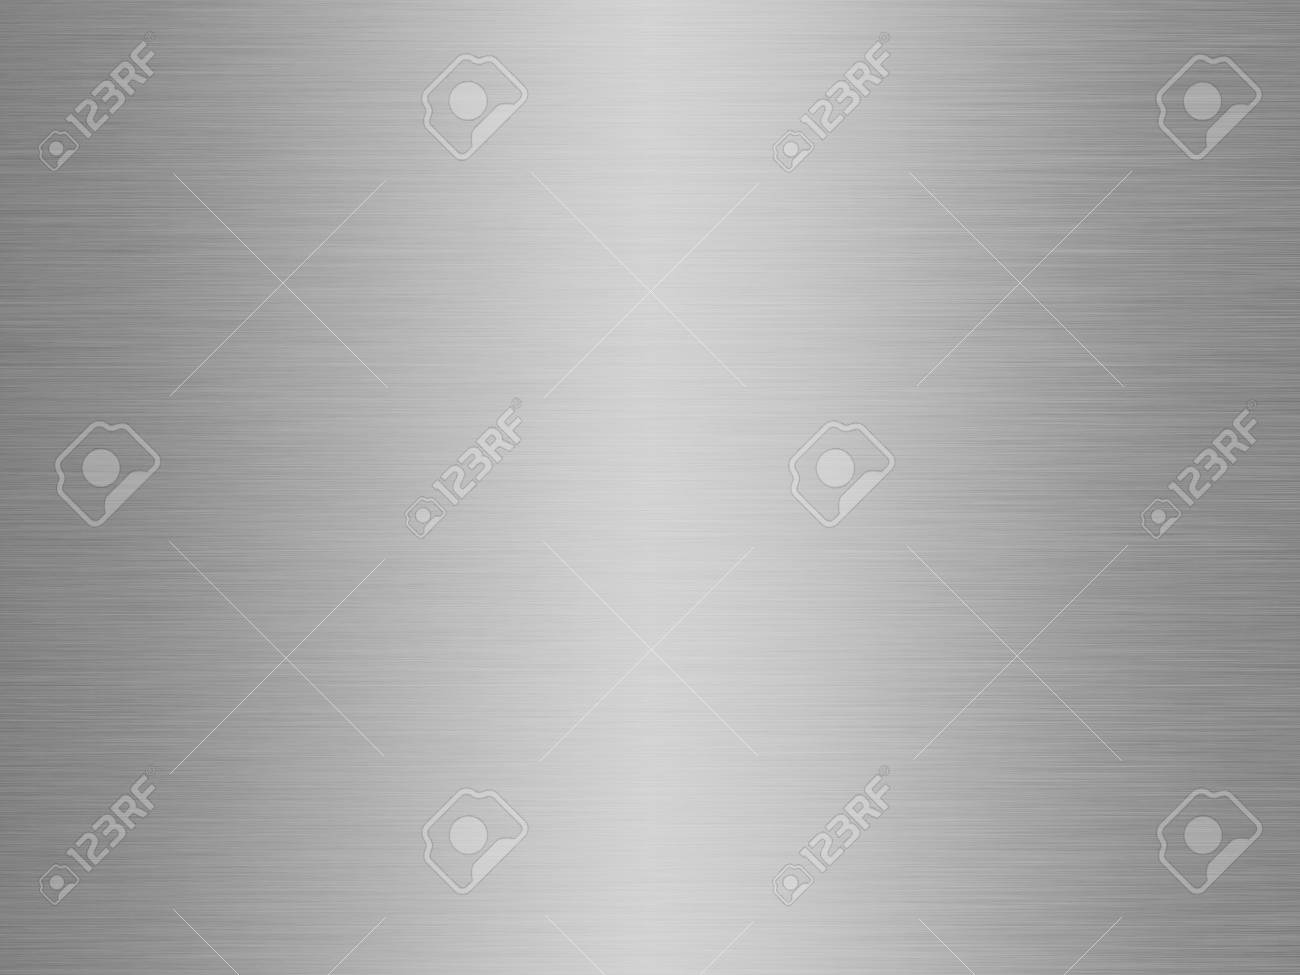 texture en acier inoxydable ou en métal texture de fond Banque d'images - 75076748